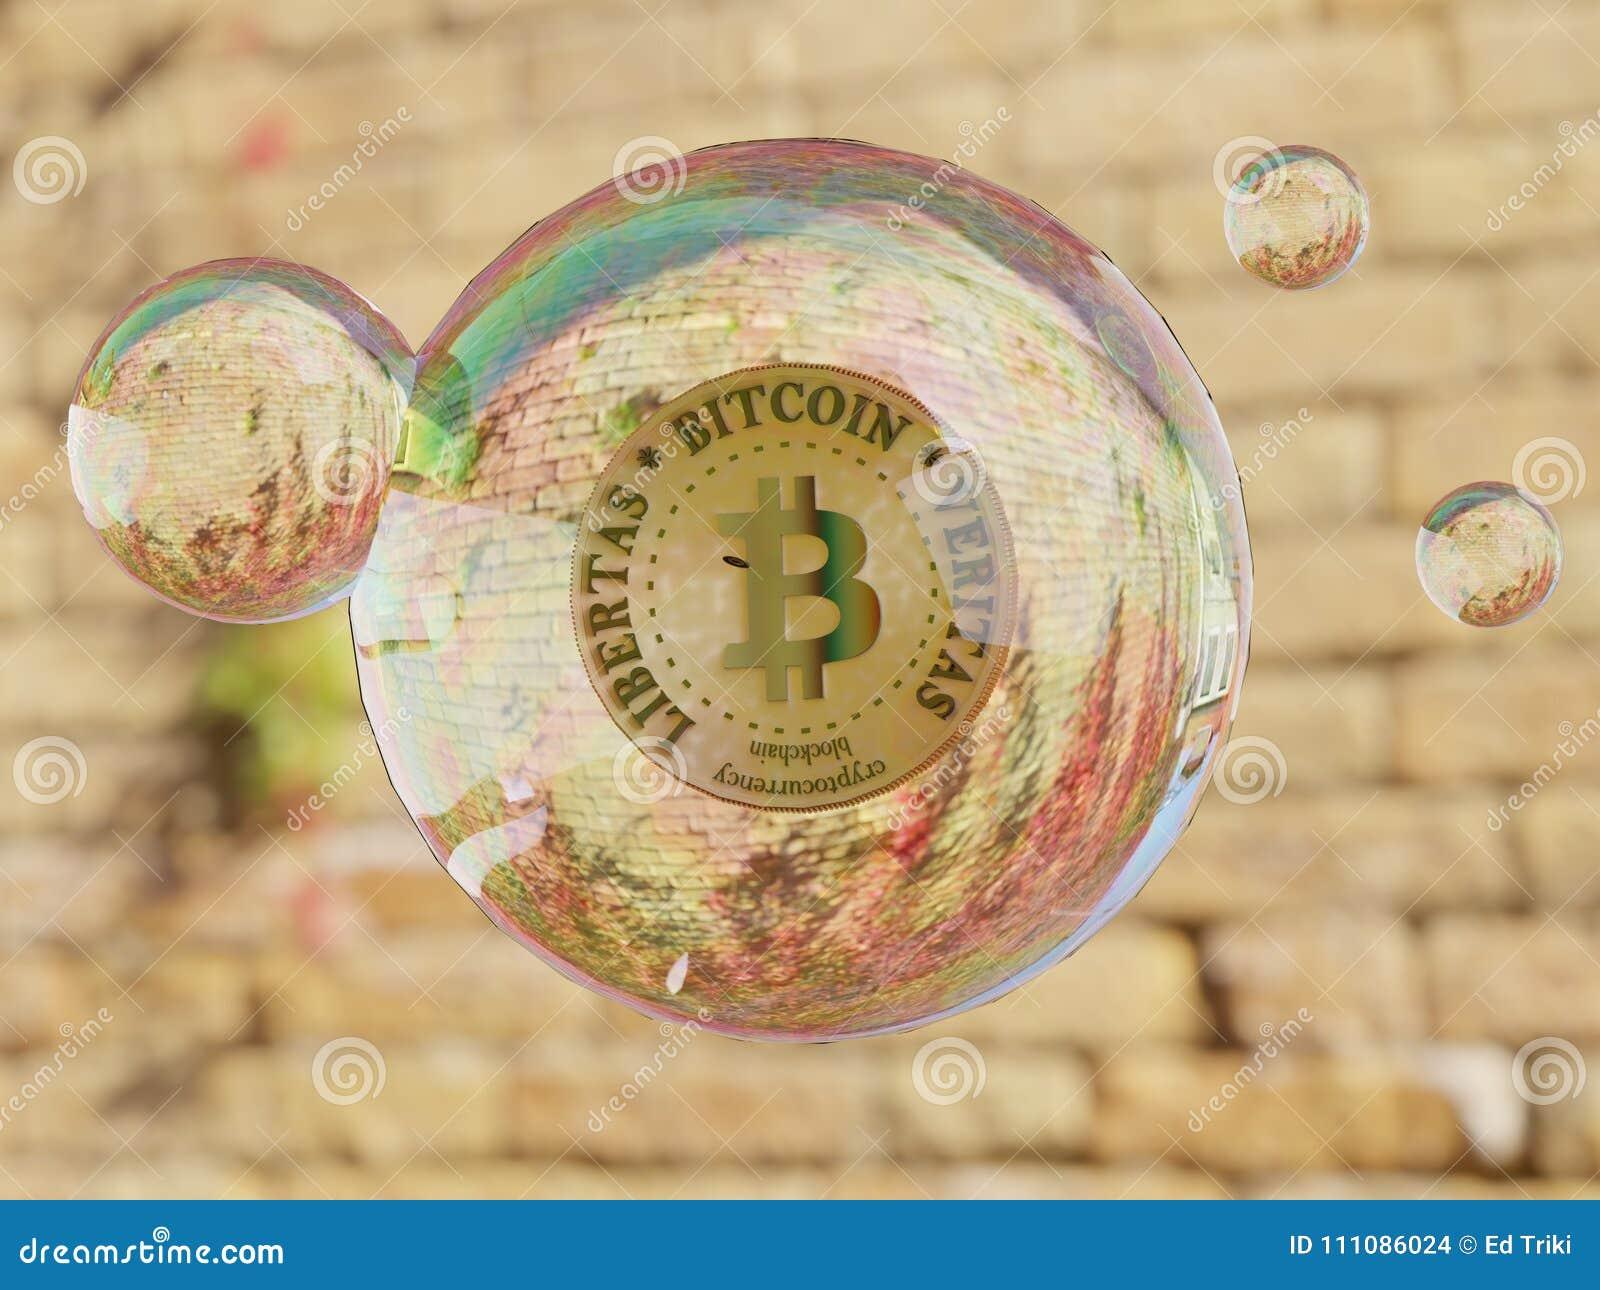 Bitcoinbel Cryptocurrency